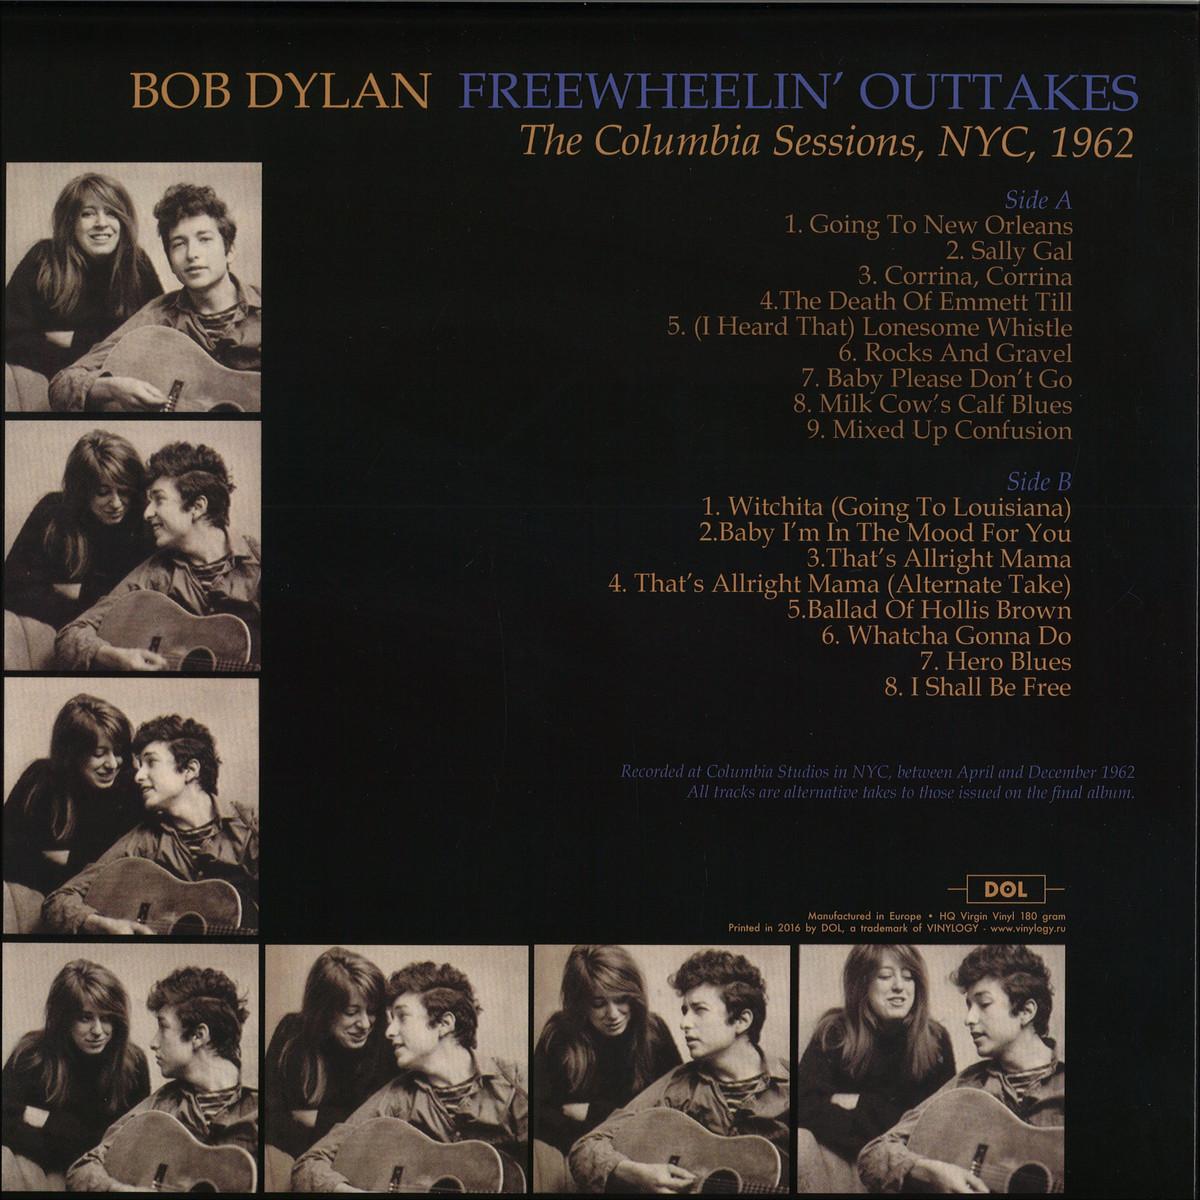 Bob Dylan - Freewheelin' Outtakes / DOL DOS607HP - Vinyl